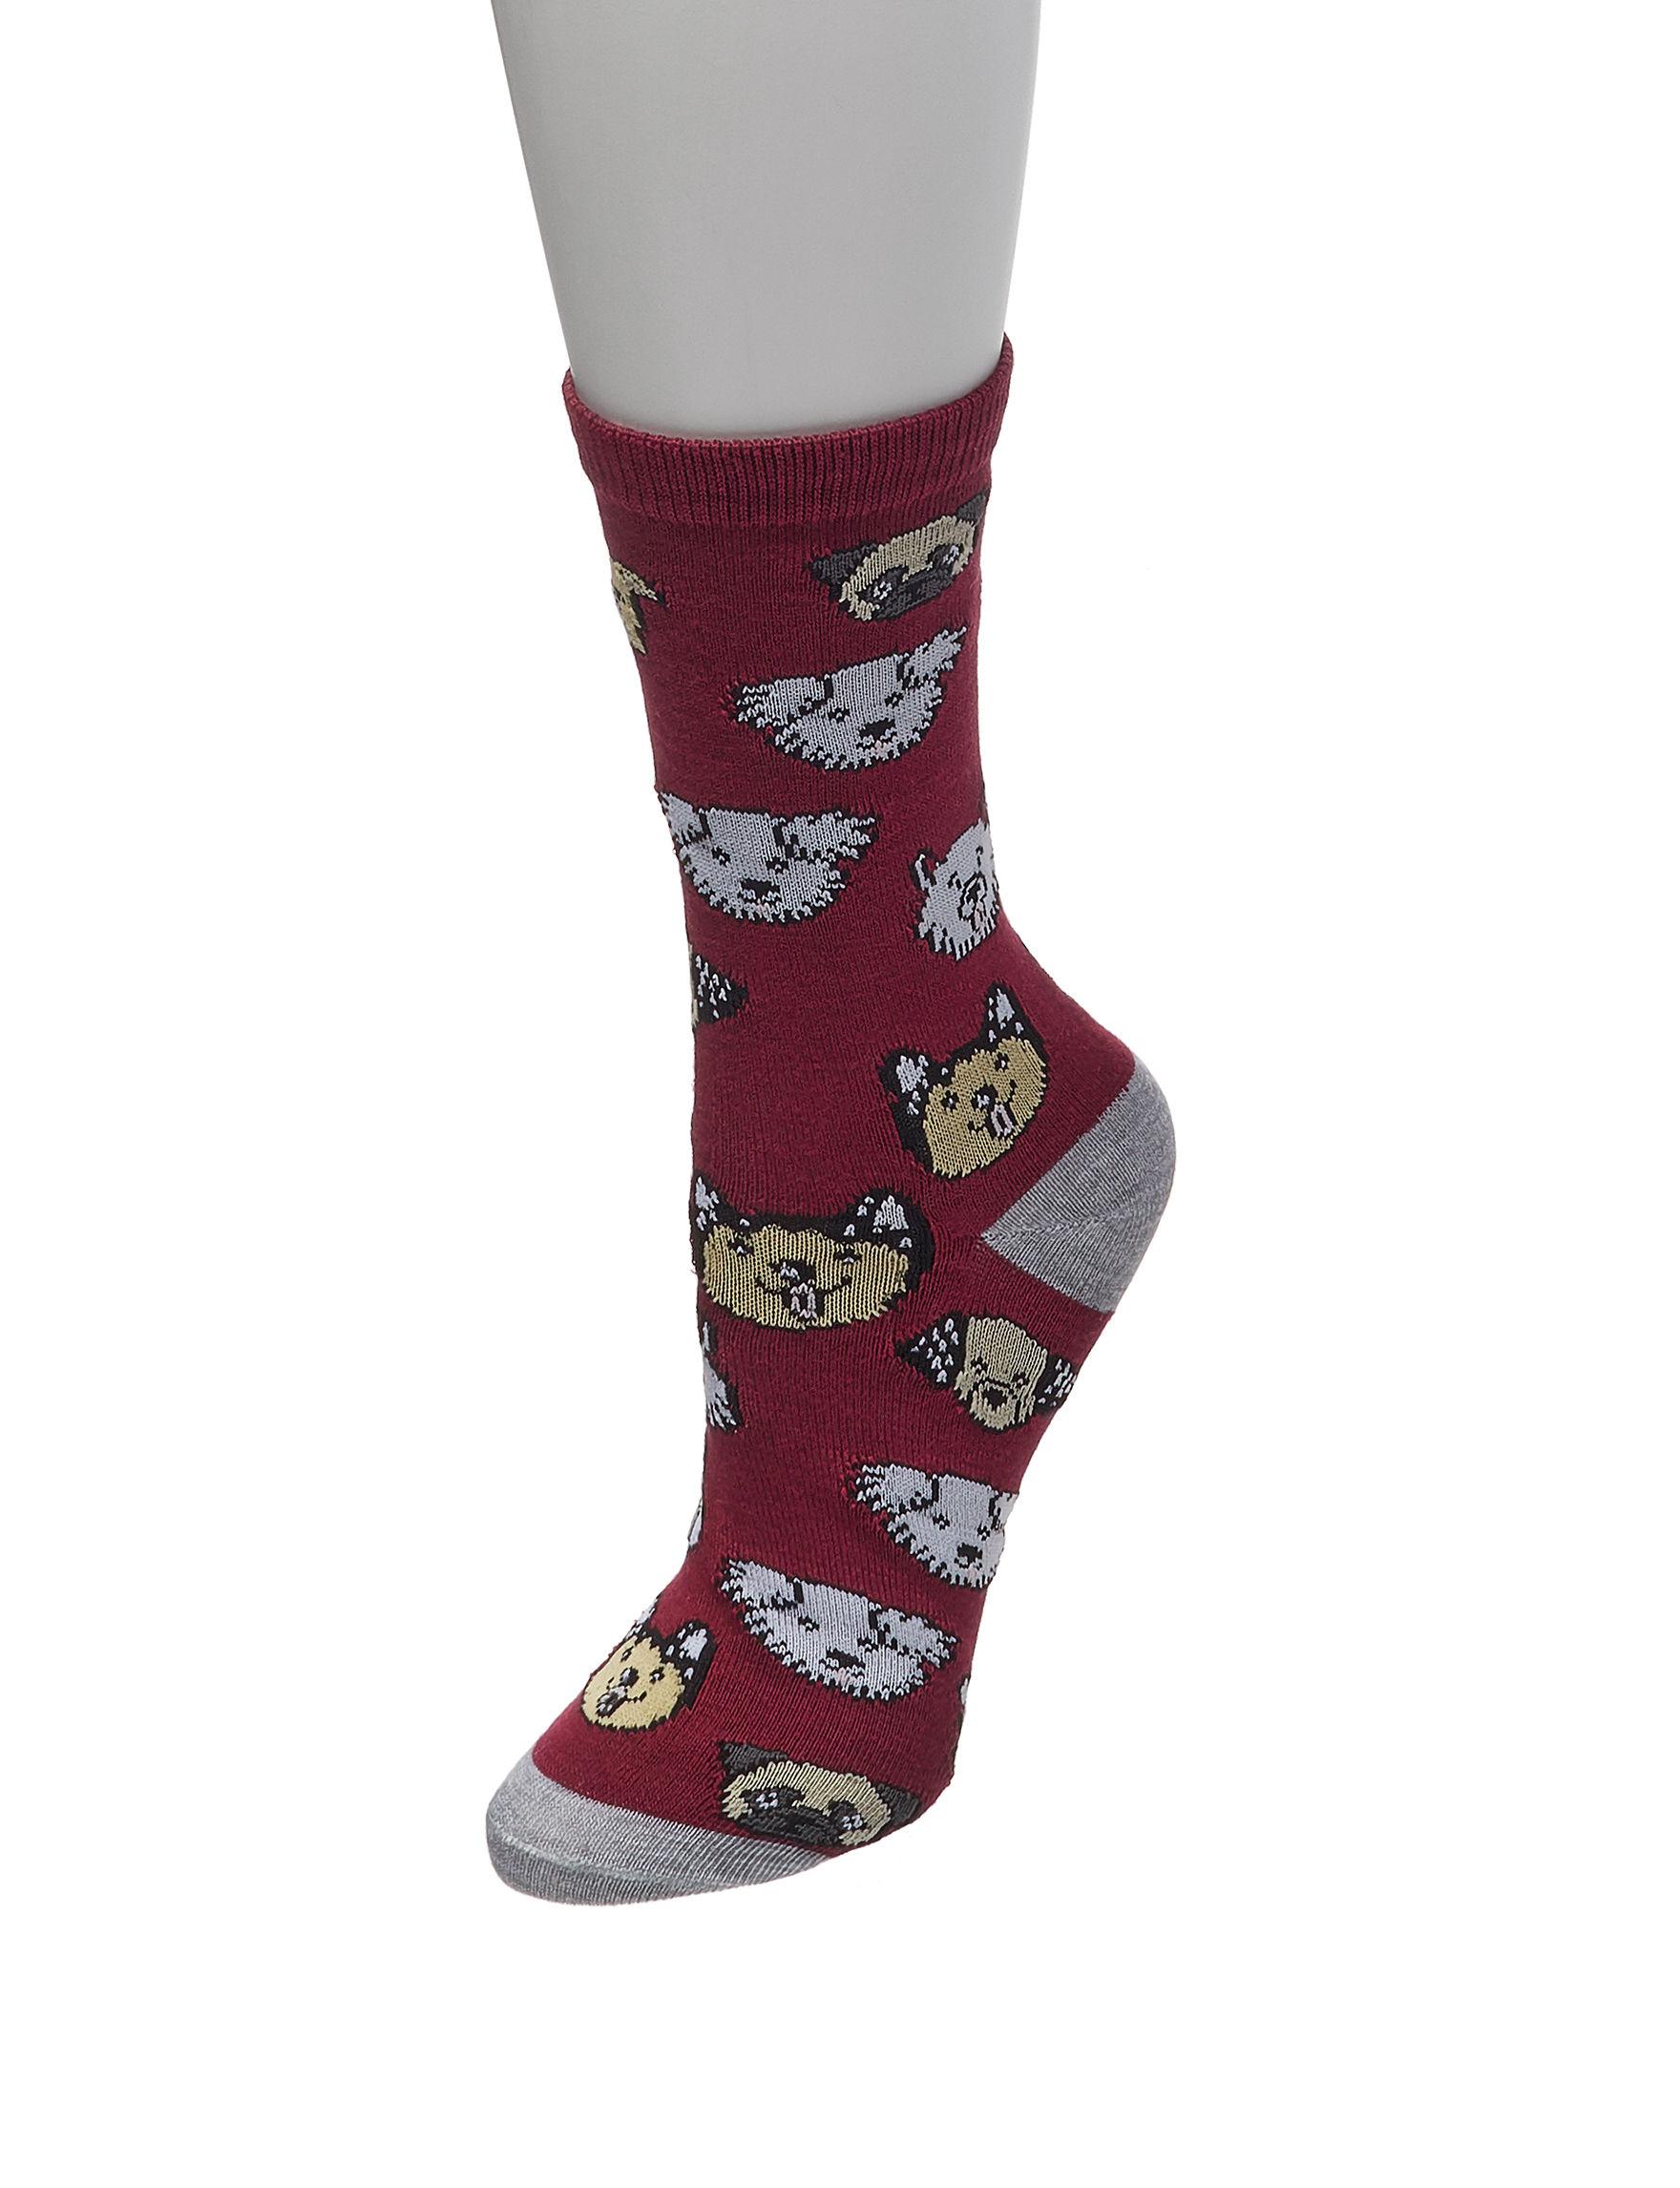 Sox & Co Burgundy Multi Socks